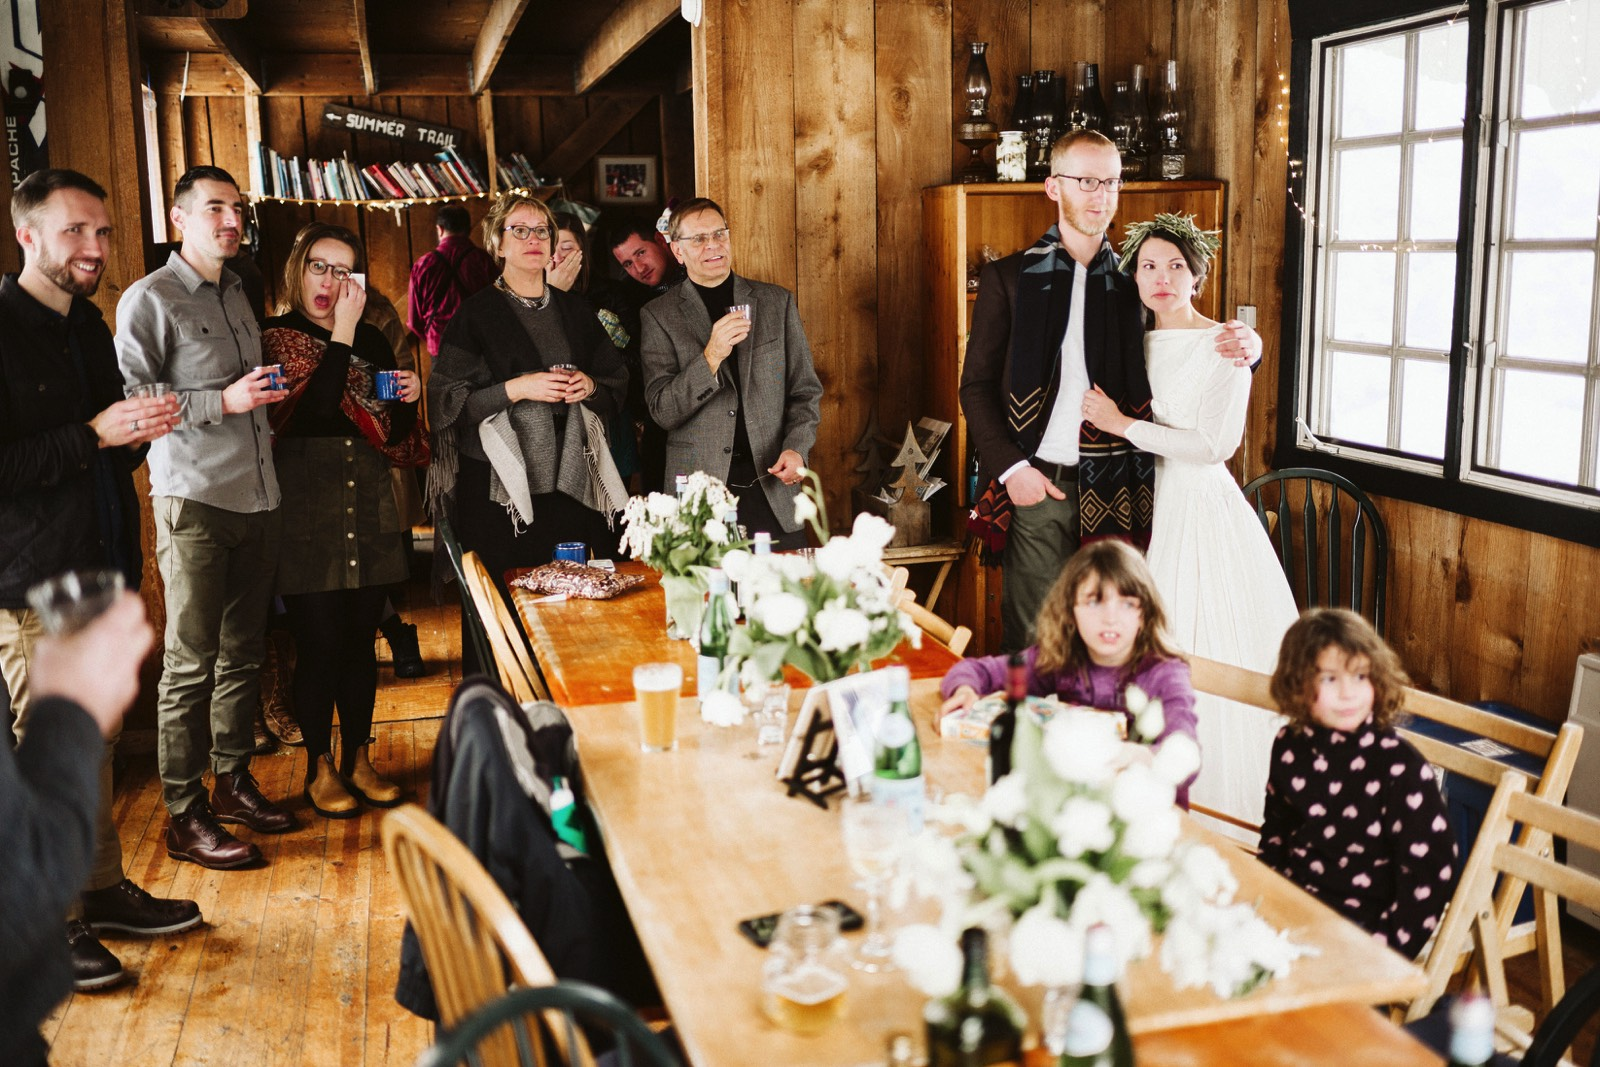 alpine-lakes-high-camp-winter-wedding-82 ALPINE LAKES HIGH CAMP WEDDING